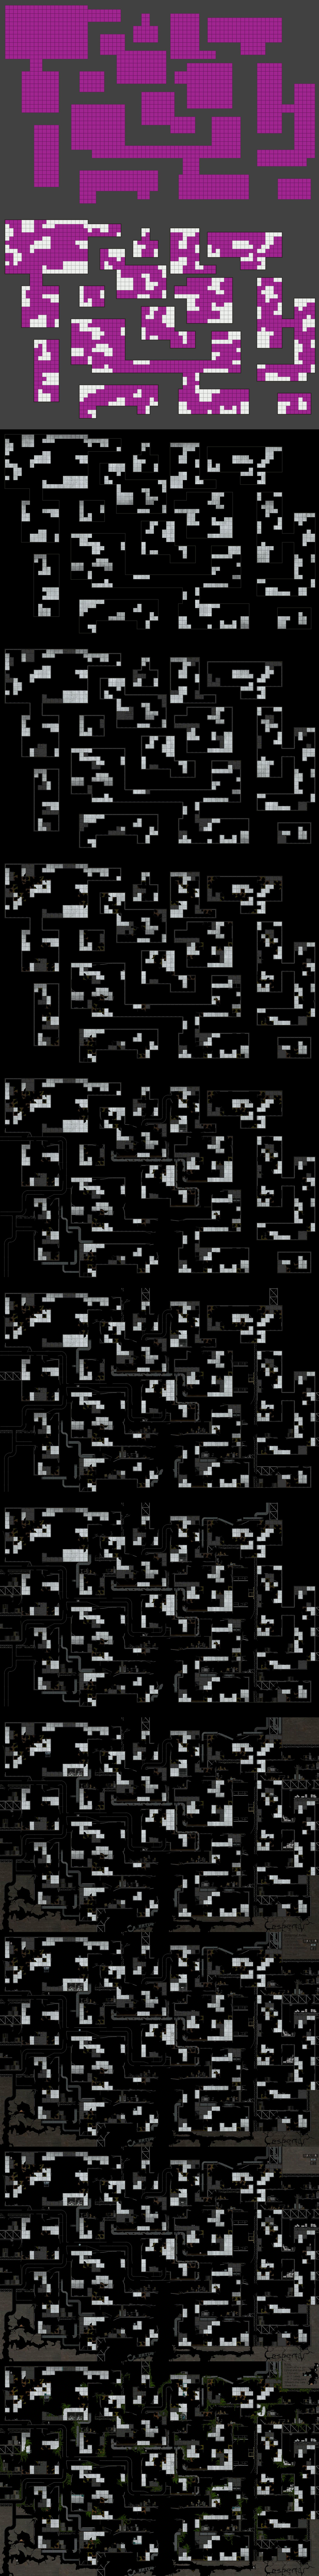 Portal complex steps